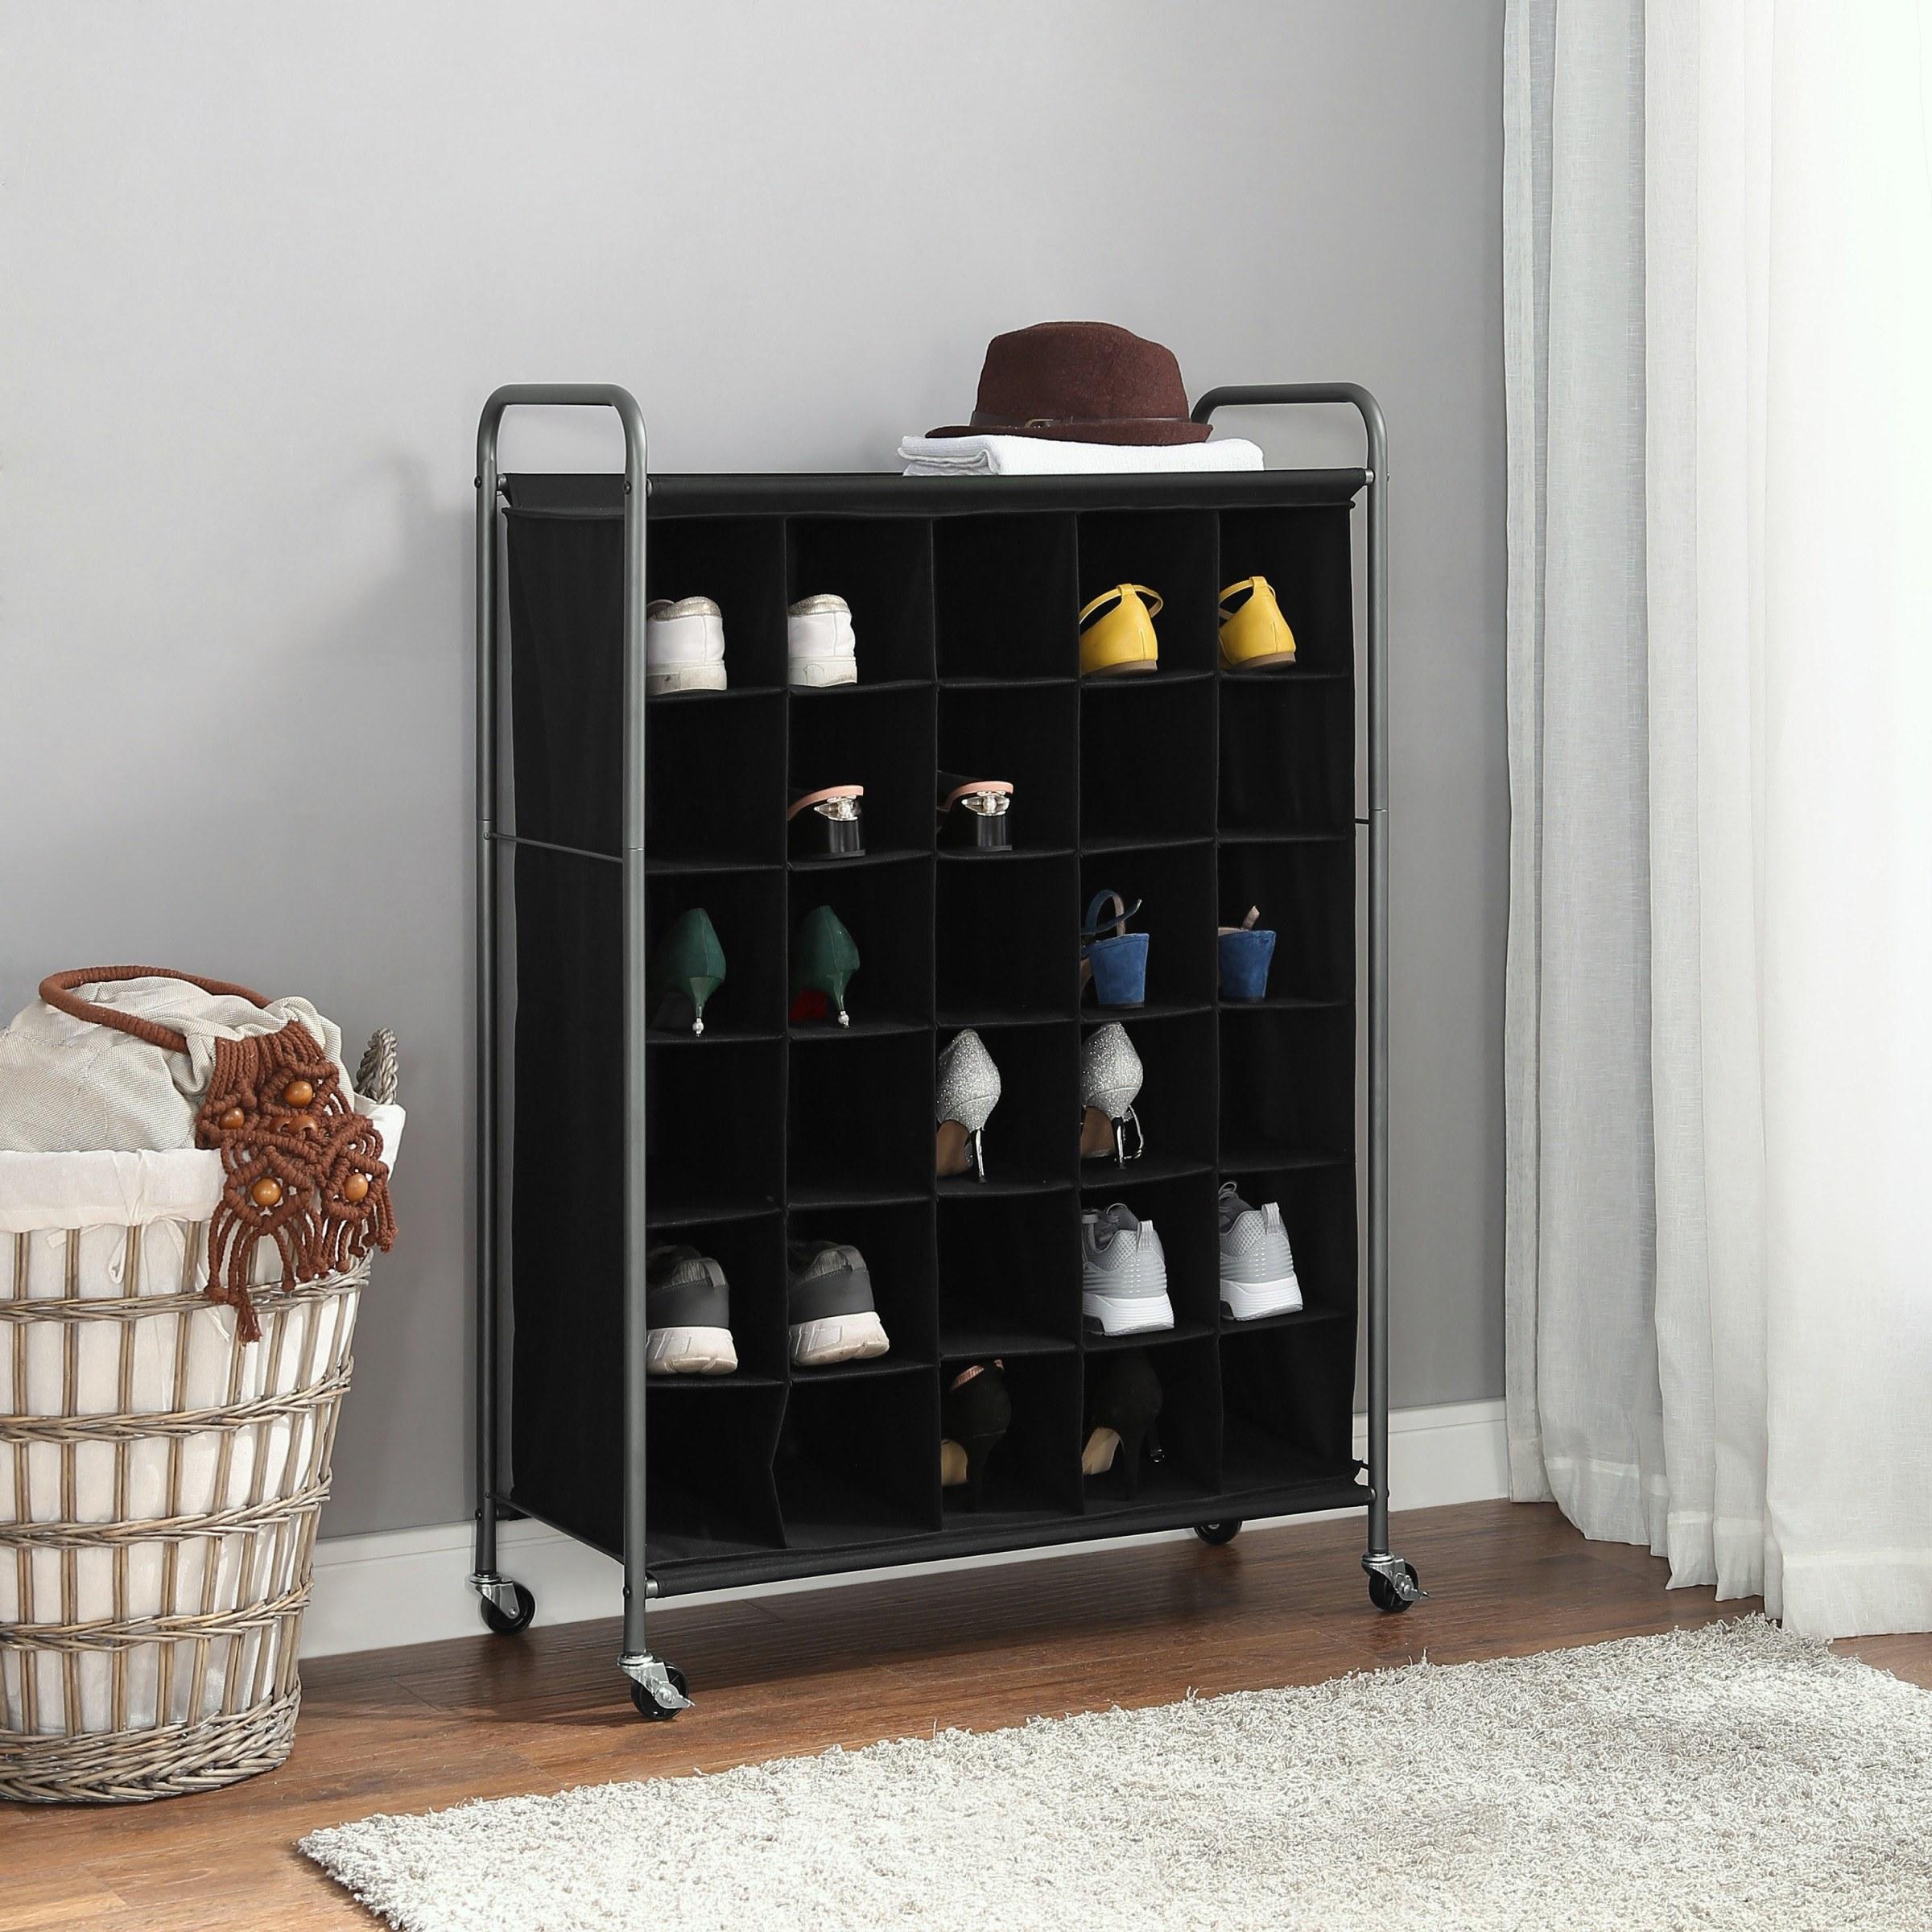 Black shoe organizer with gray railings